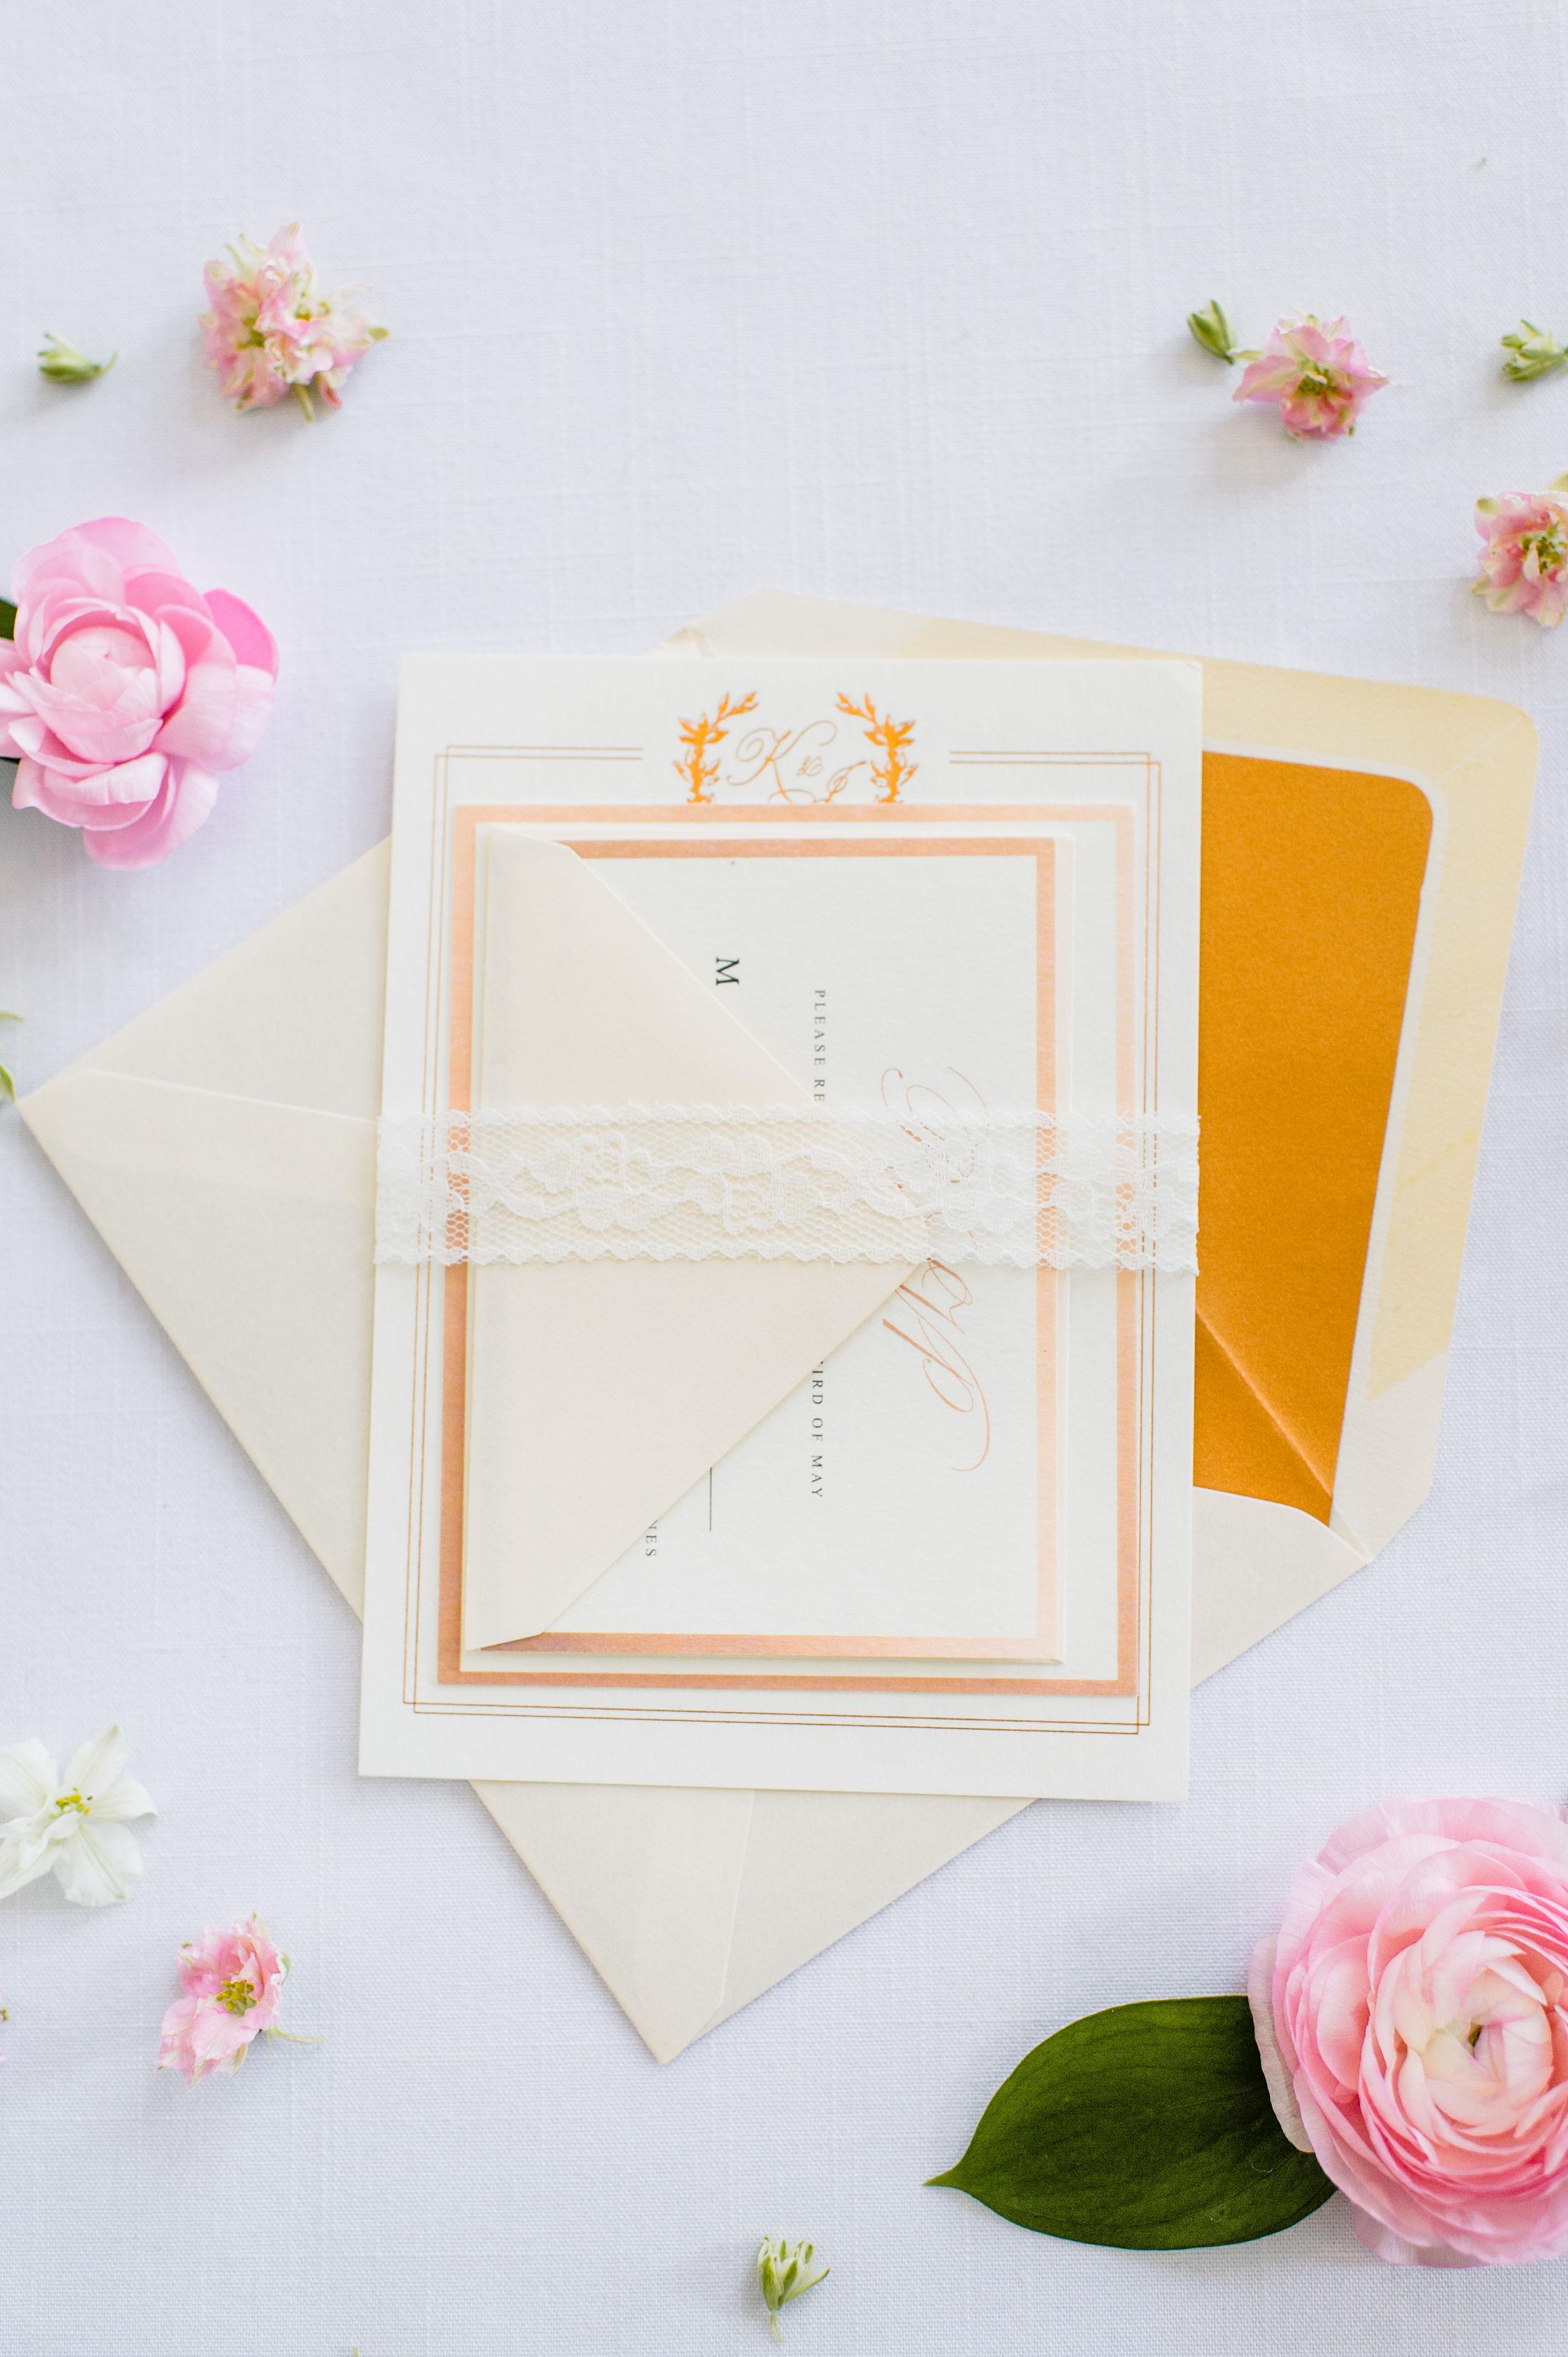 McElravey_Wedding_CarolineLimaPhotography_2018_014.jpg